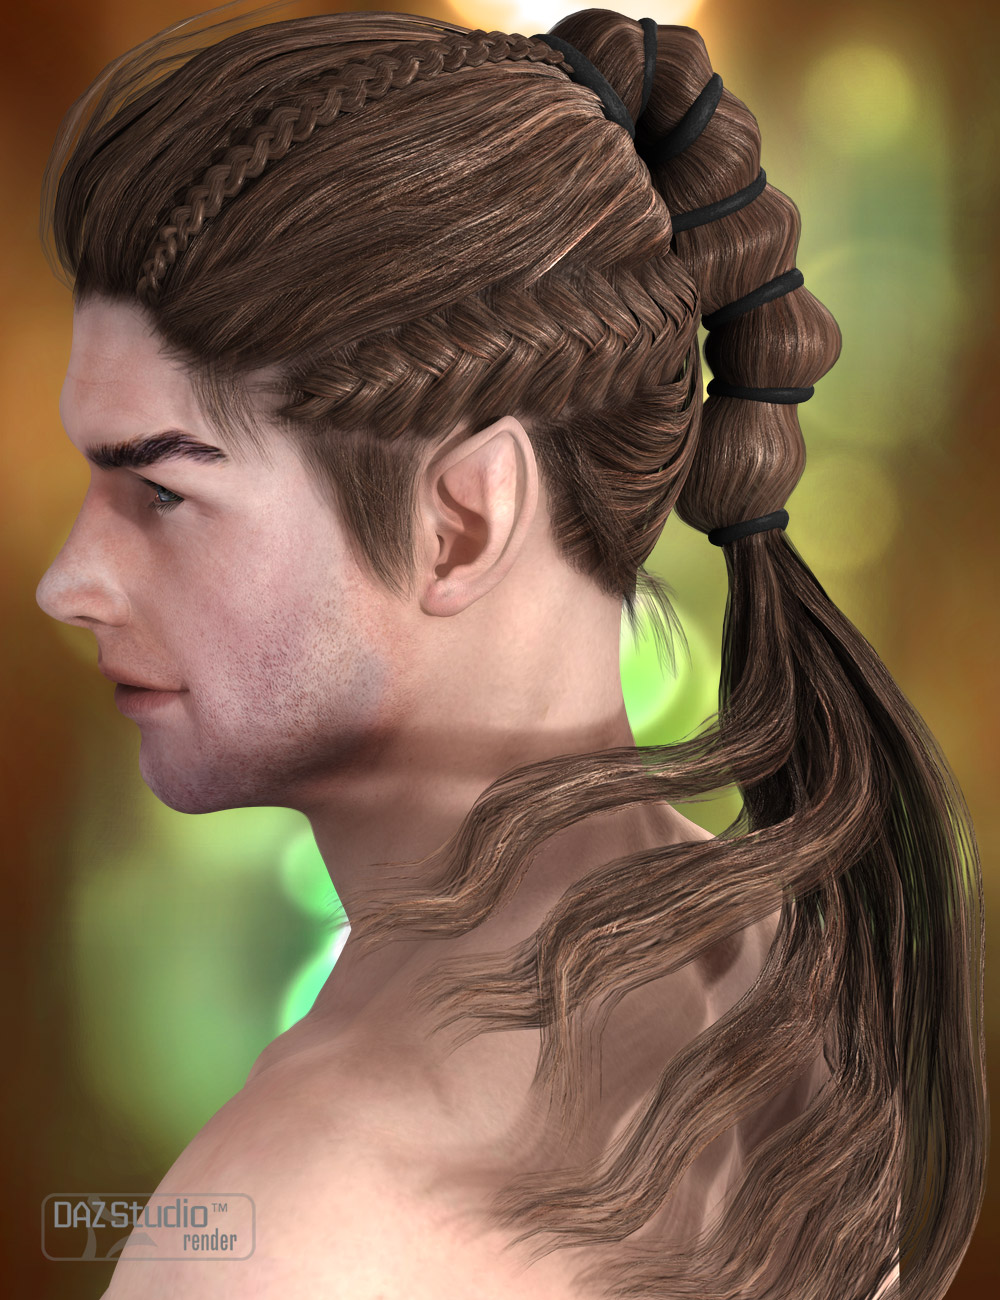 Milen Hair by: AprilYSH, 3D Models by Daz 3D